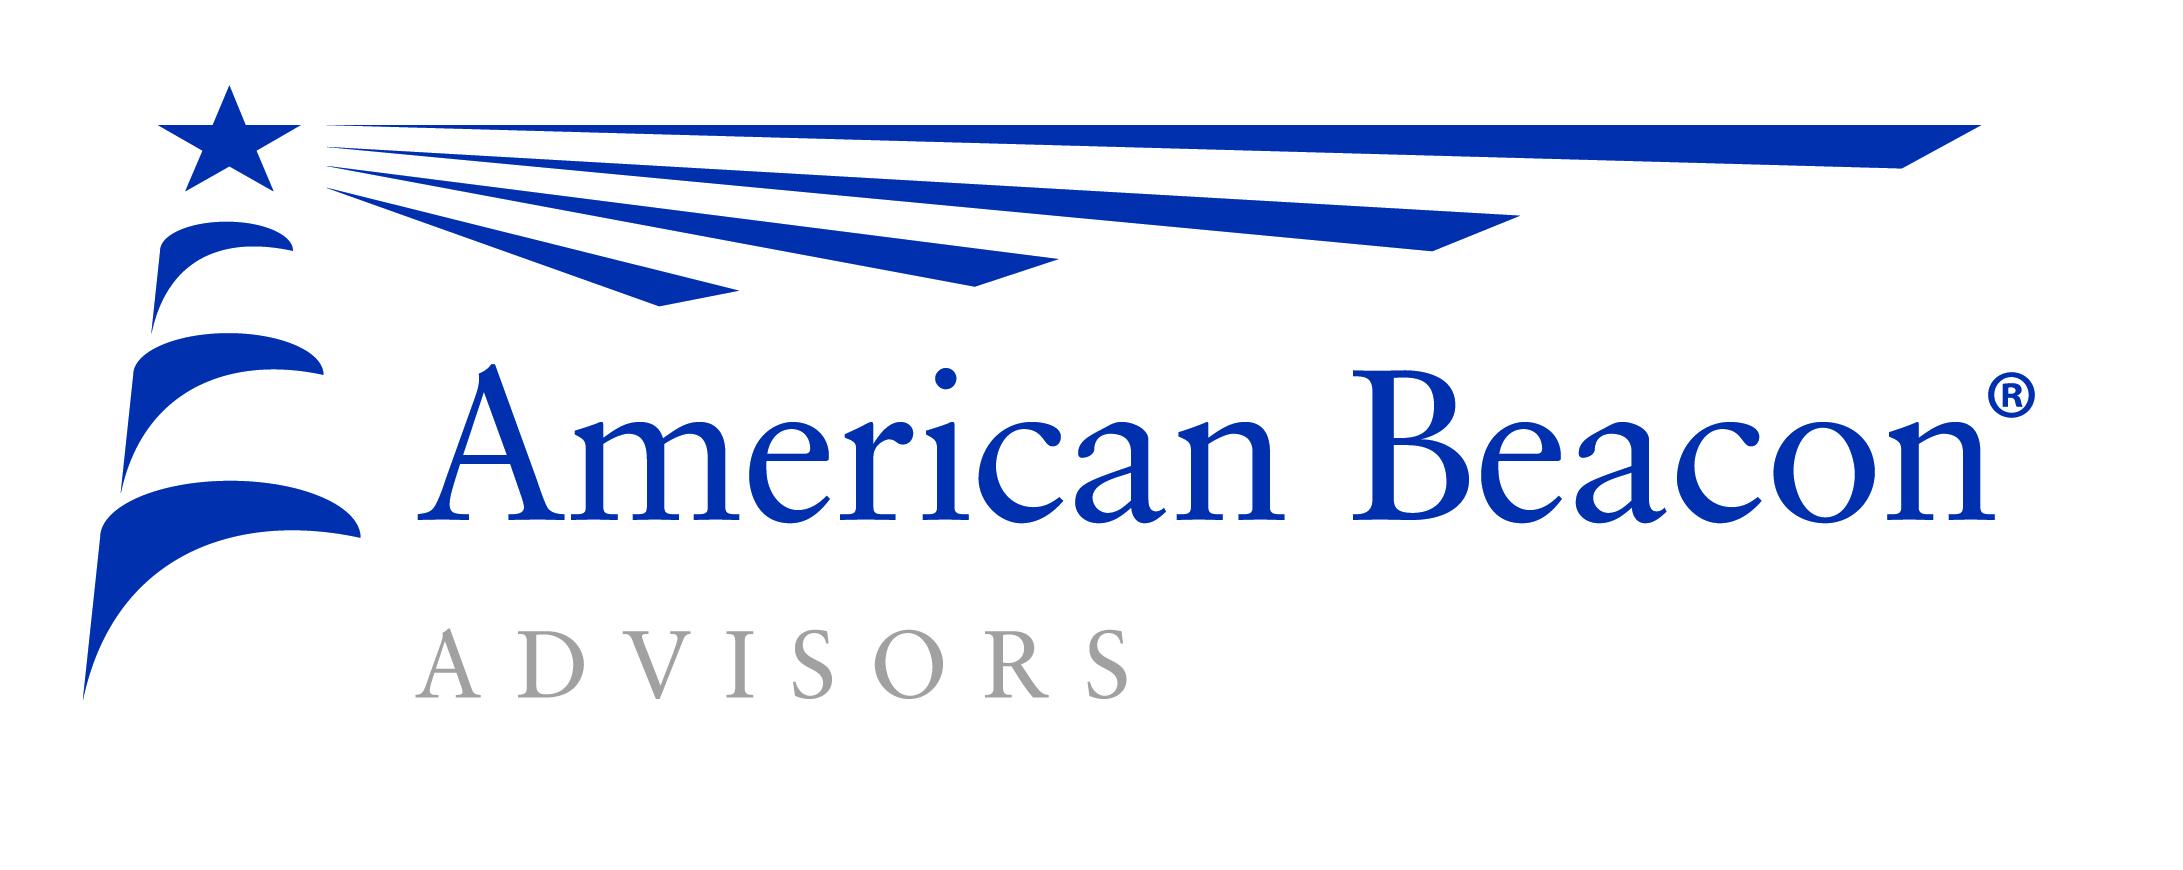 American beacon advisors reaches agreement to be acquired by kelso american beacon advisors reaches agreement to be acquired by kelso company and estancia capital management publicscrutiny Images